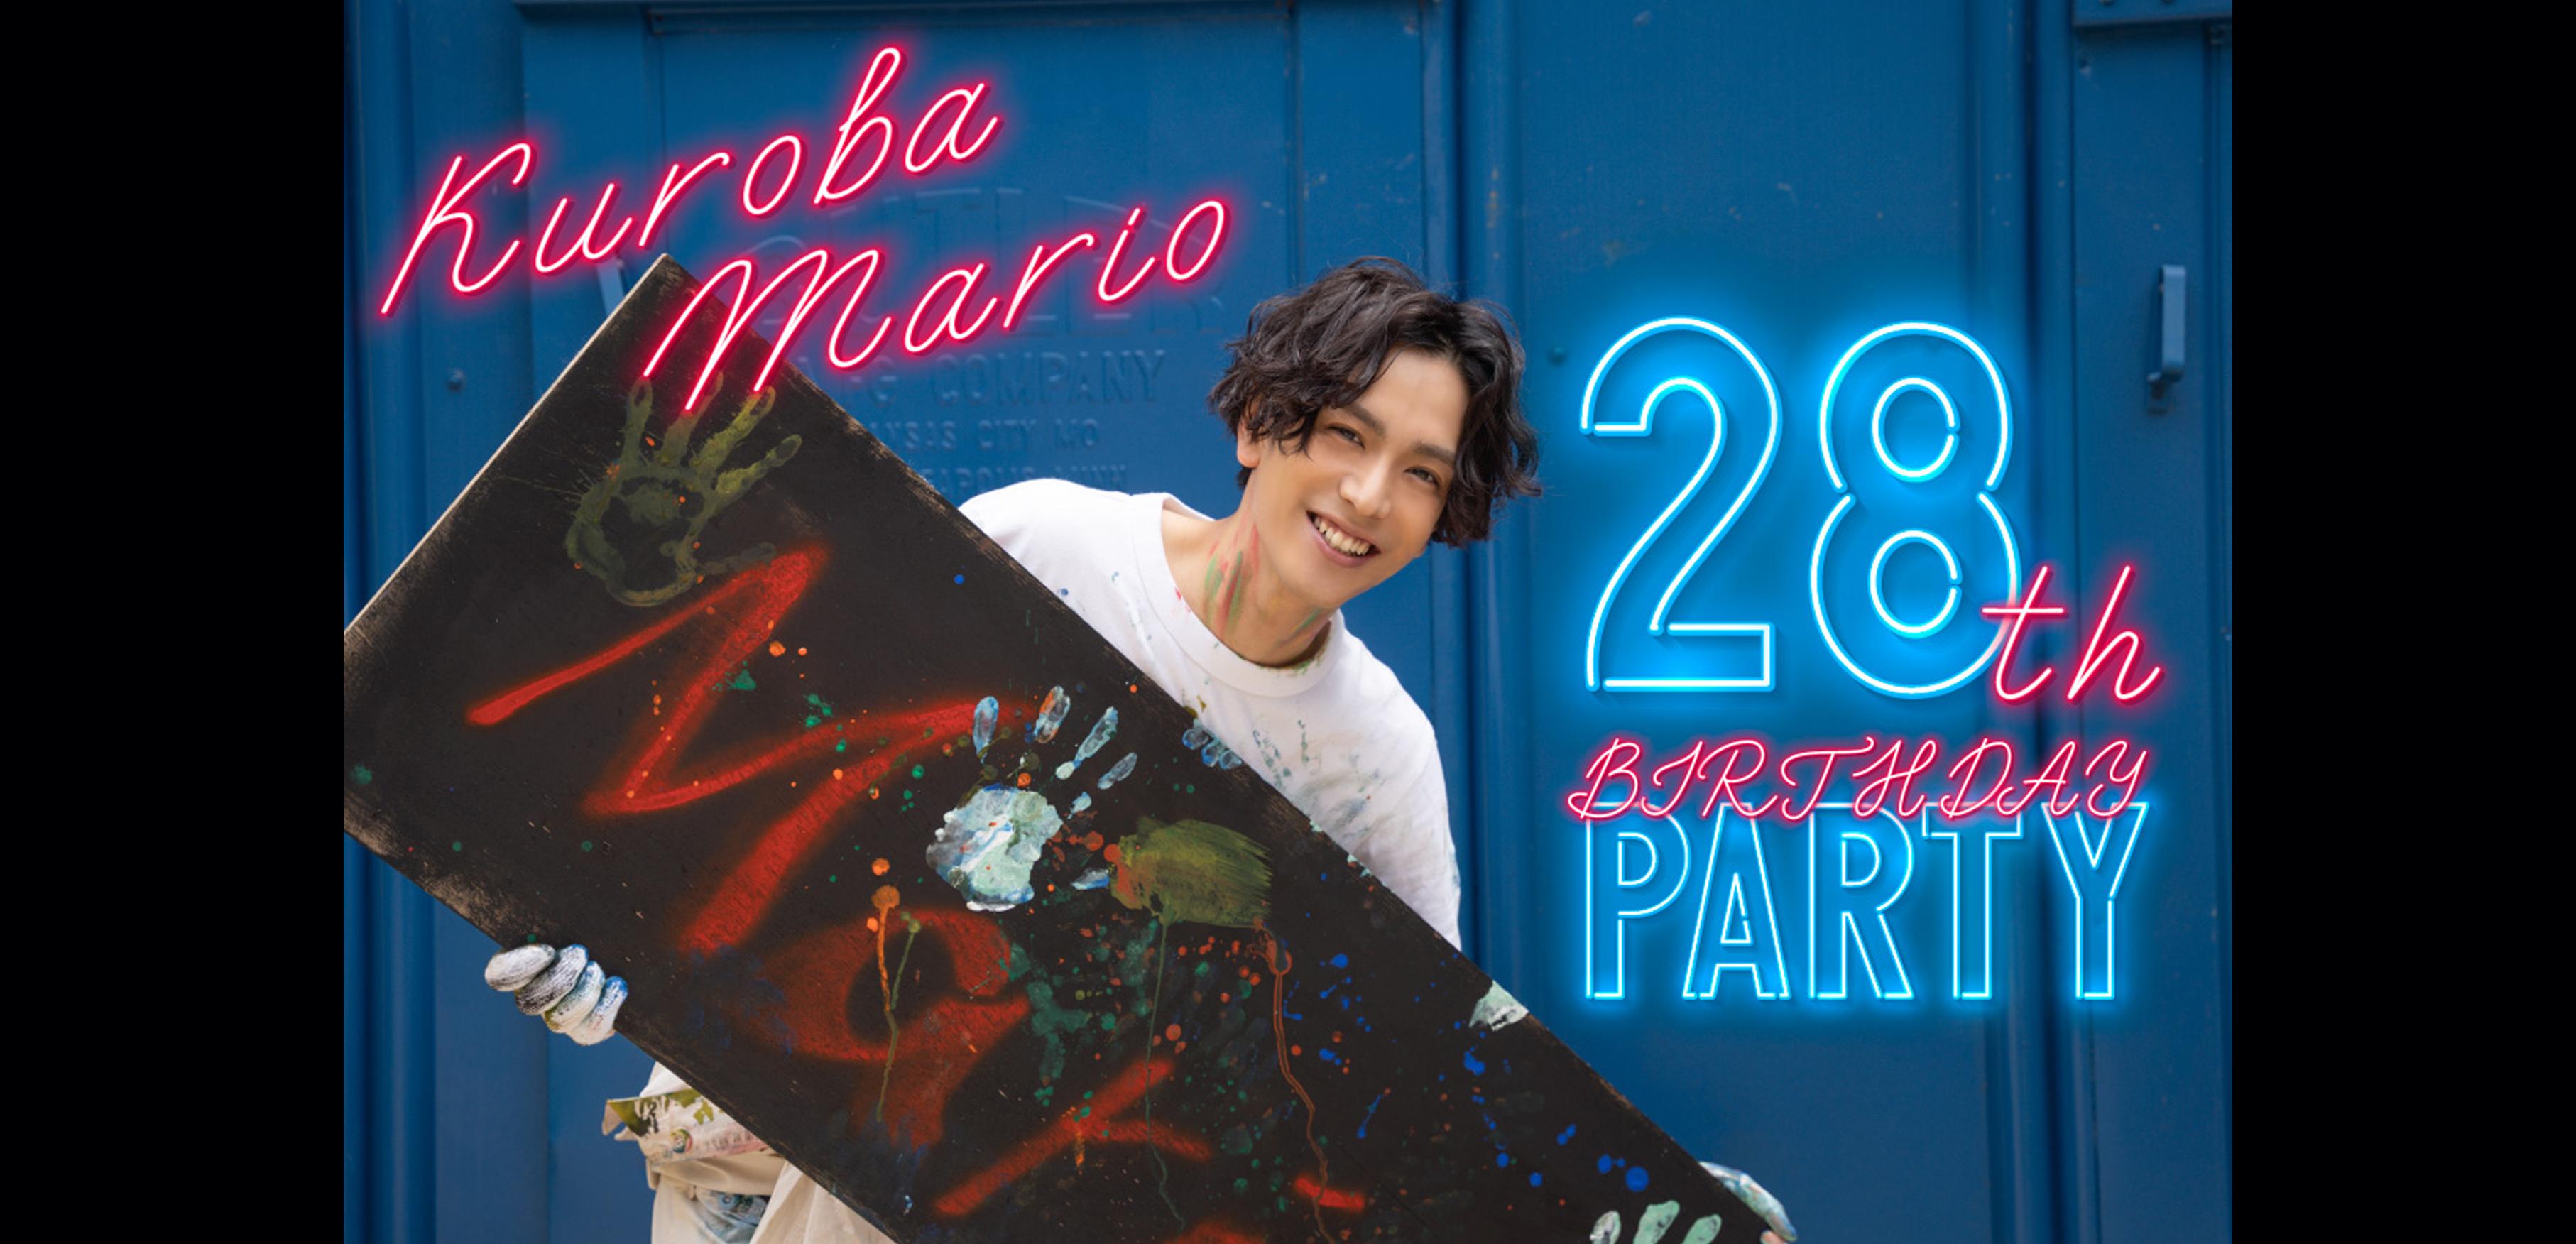 黒羽麻璃央 28th BirthdayParty